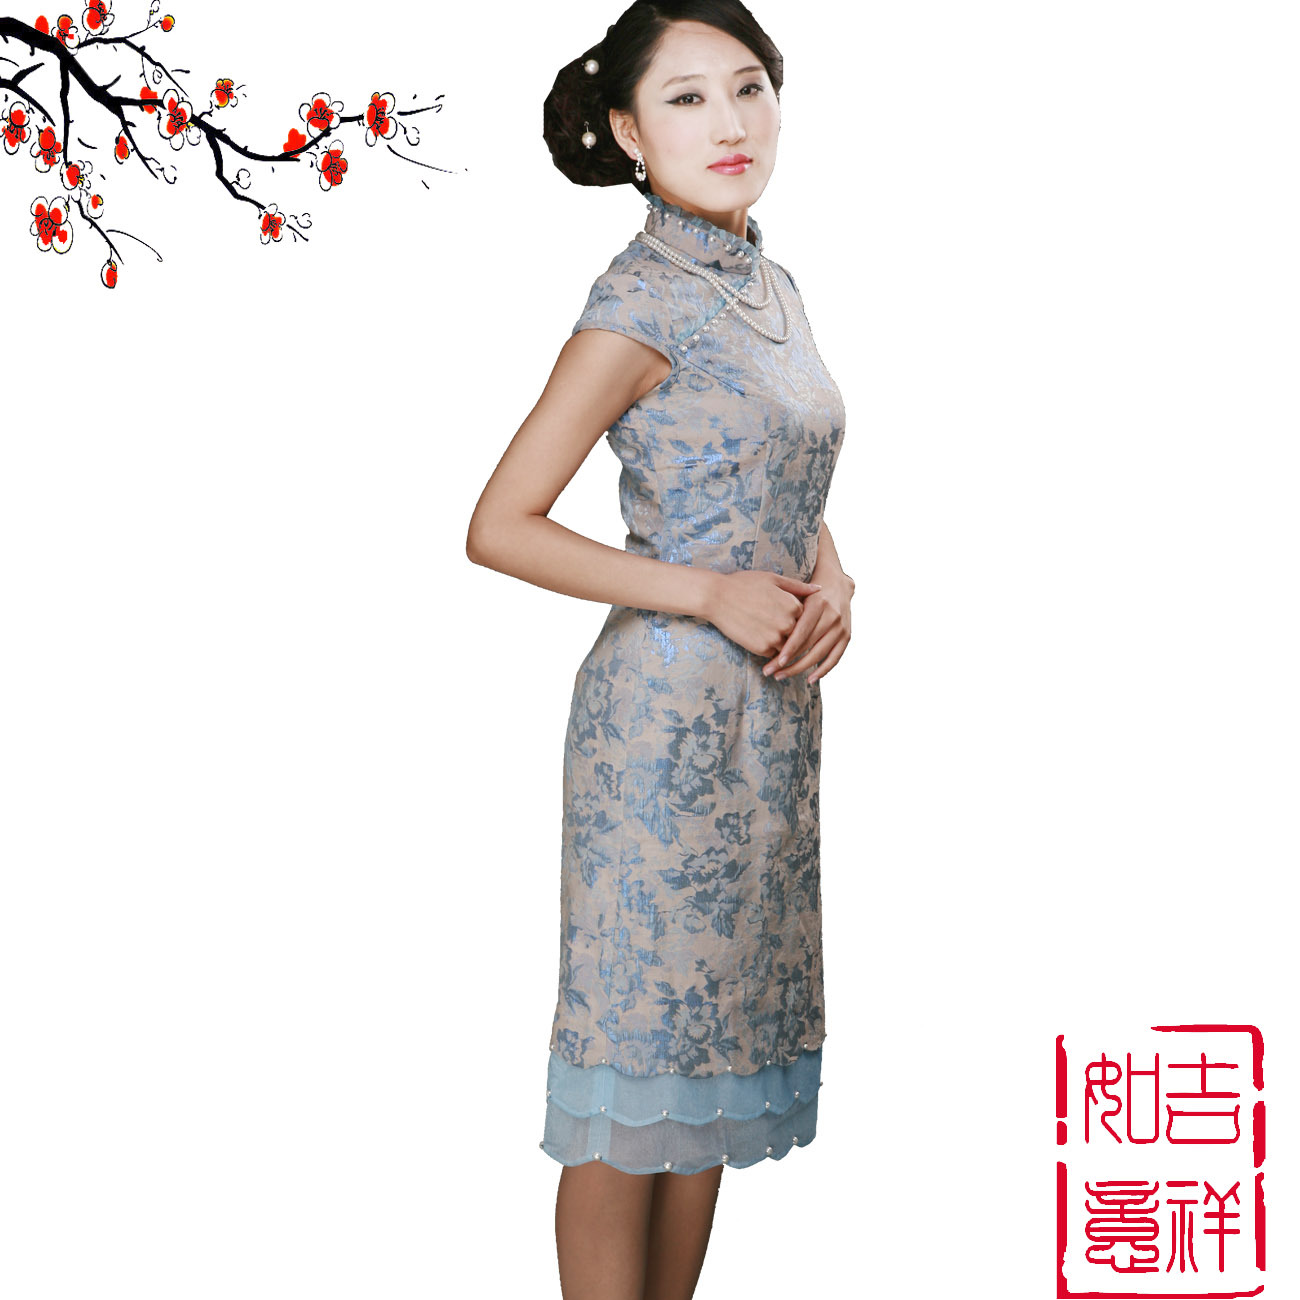 Платье Ципао   2011, 160